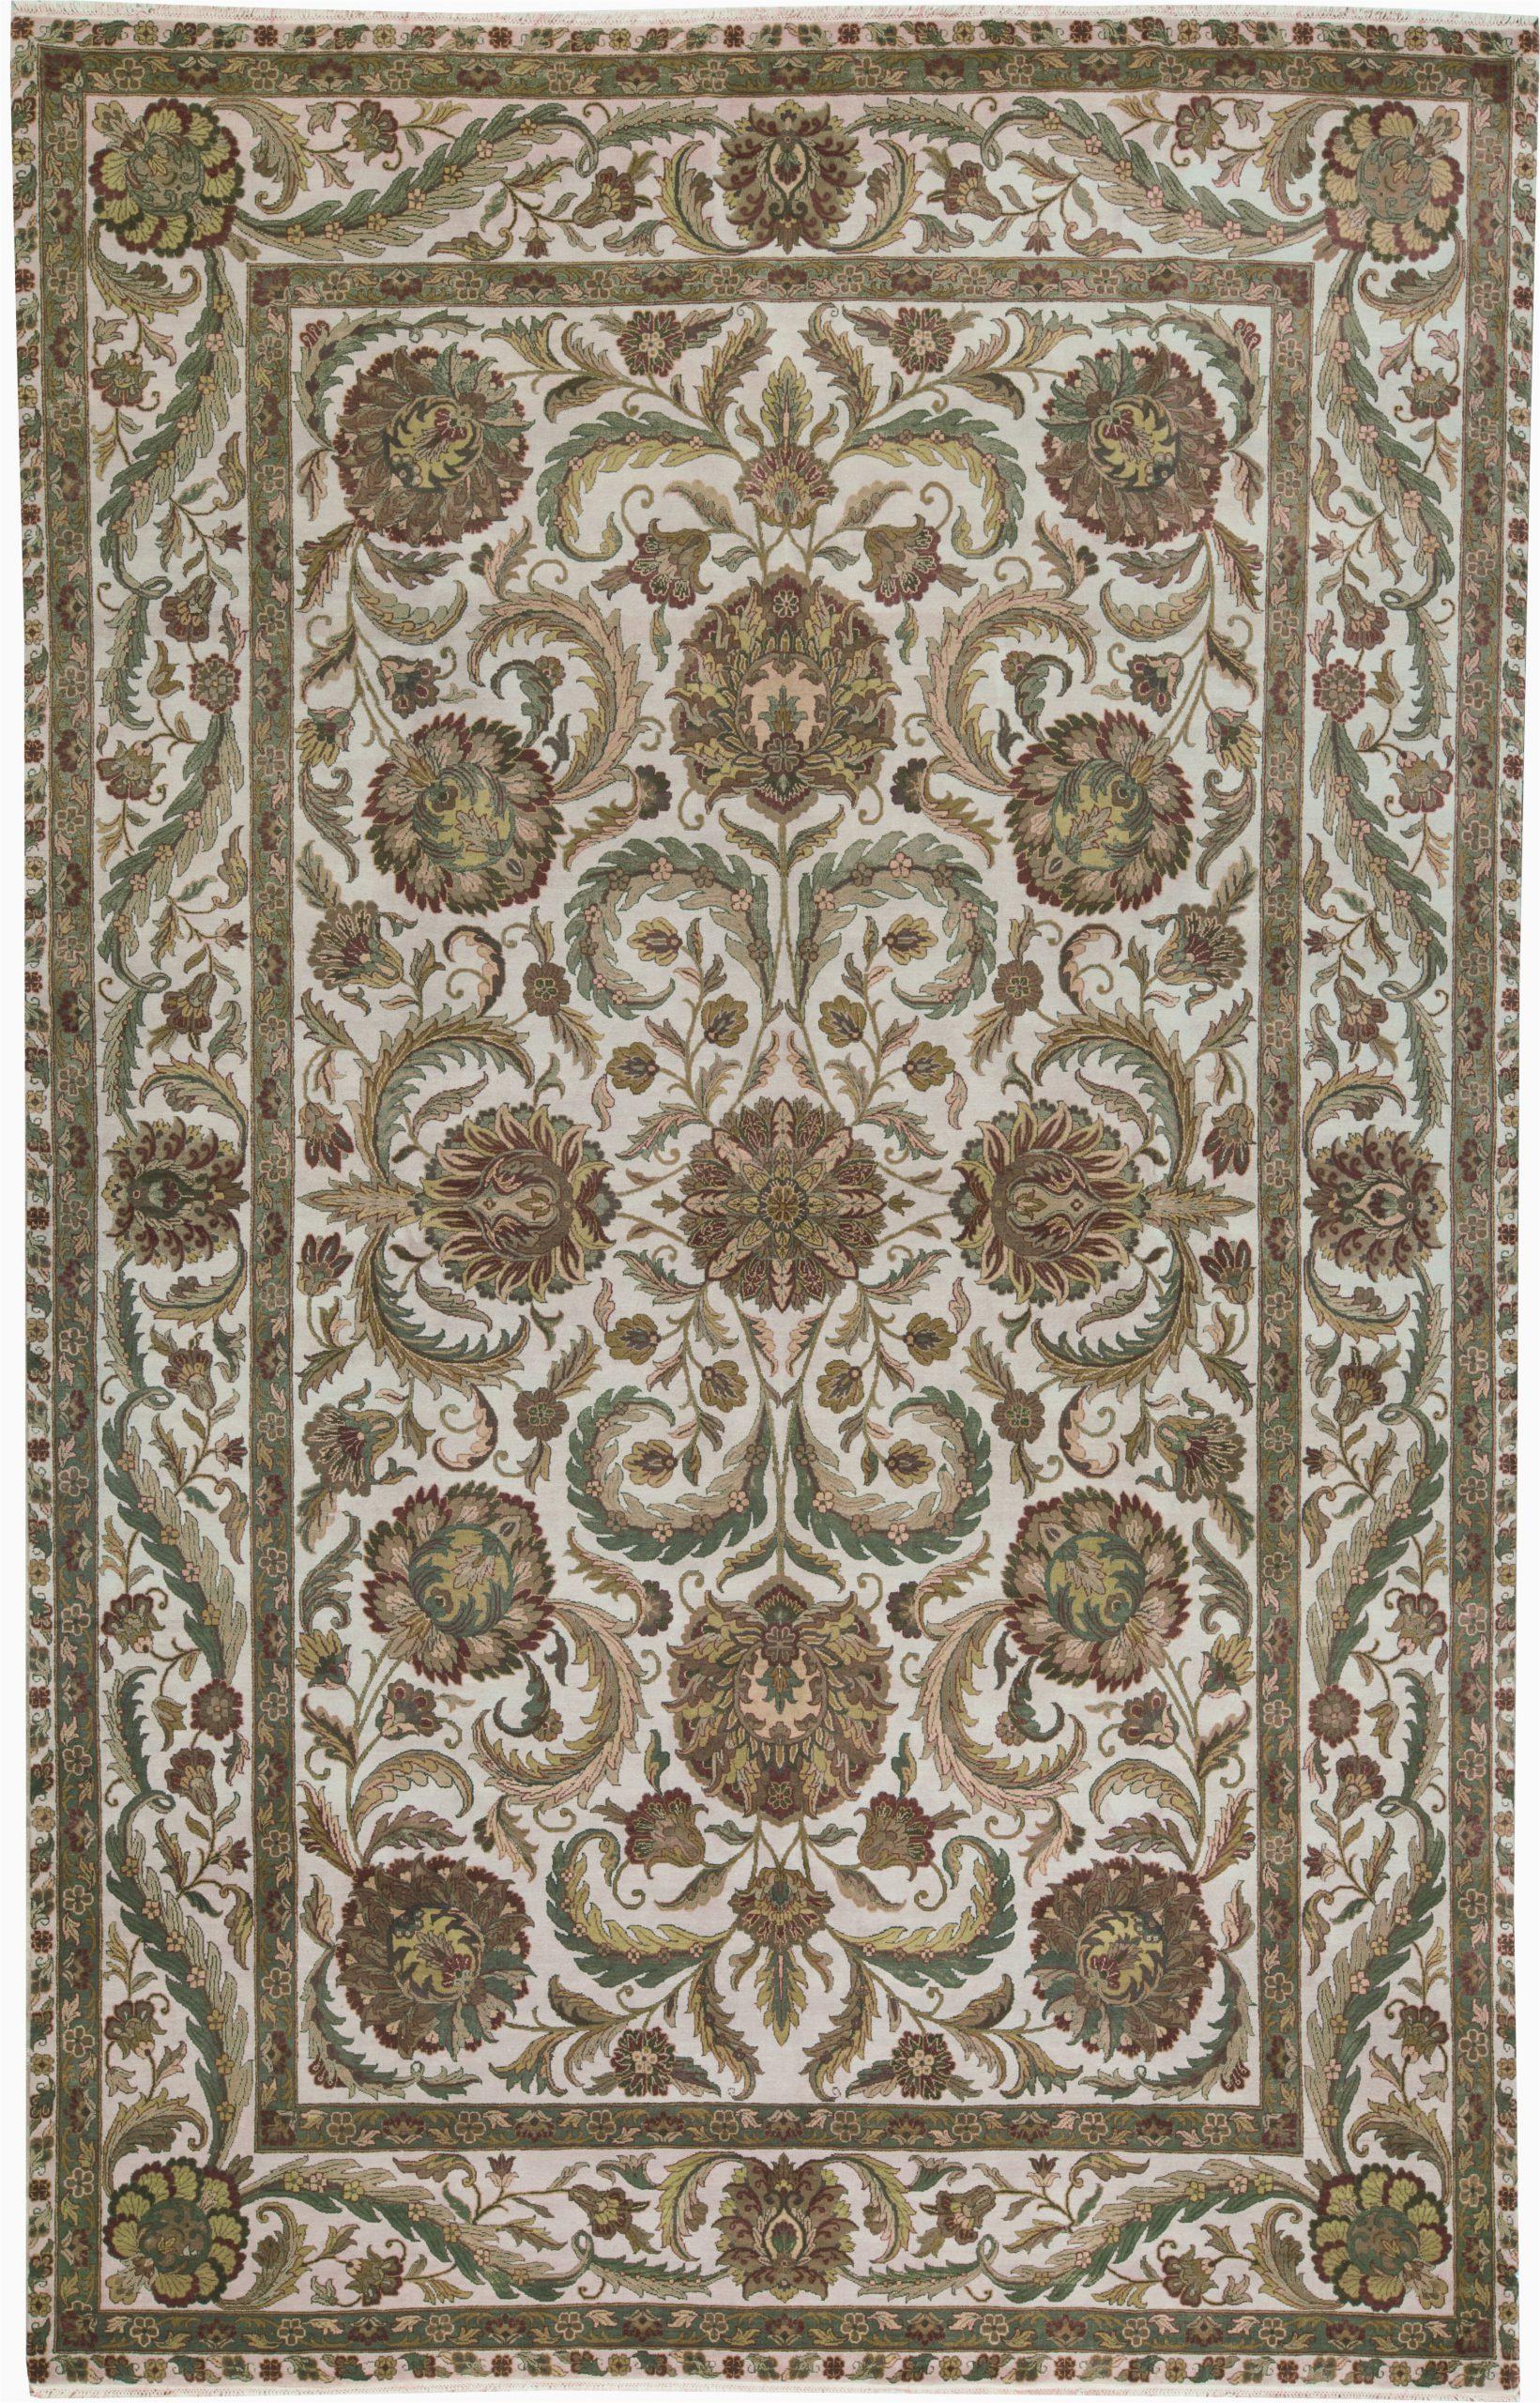 bokara rug co inc one of a kind crown select handwoven 1110 x 183 wool greenivory area rug abhd2435